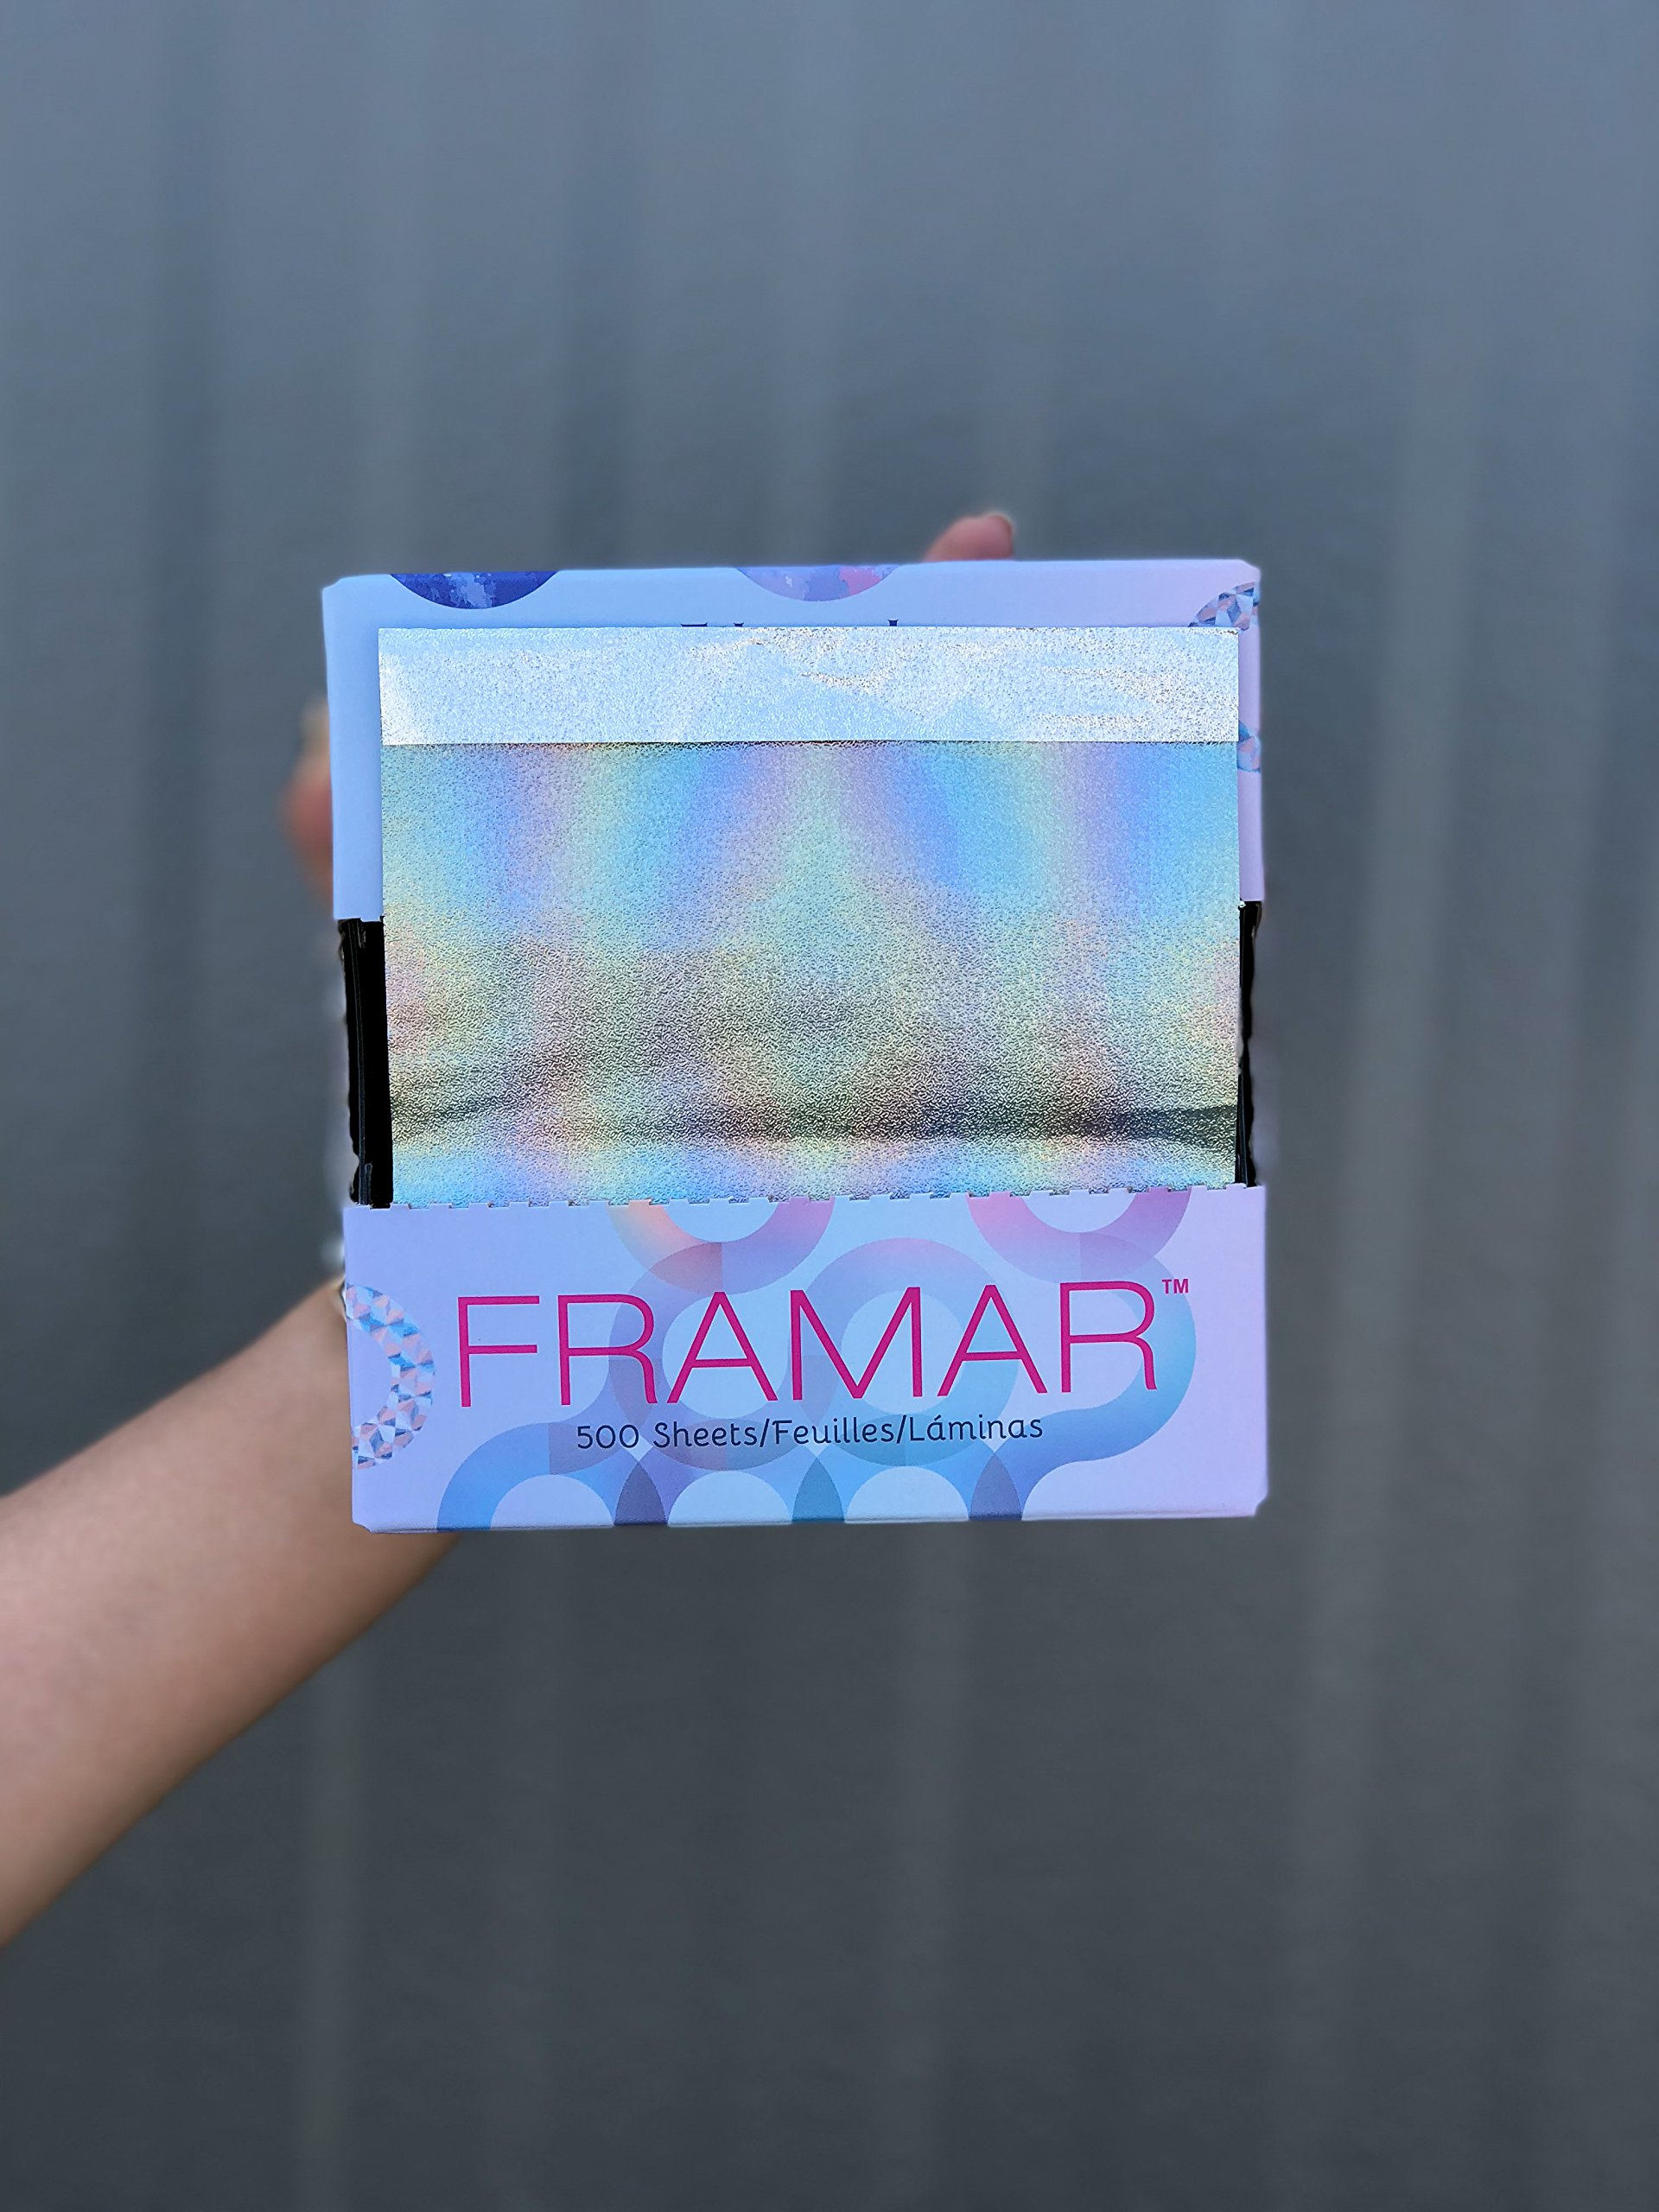 Framar Ethereal Pop Up Hair Foil, Aluminum Foil Sheets, Hair Foils For Highlighting - 500 Foil Sheets by FRAMAR